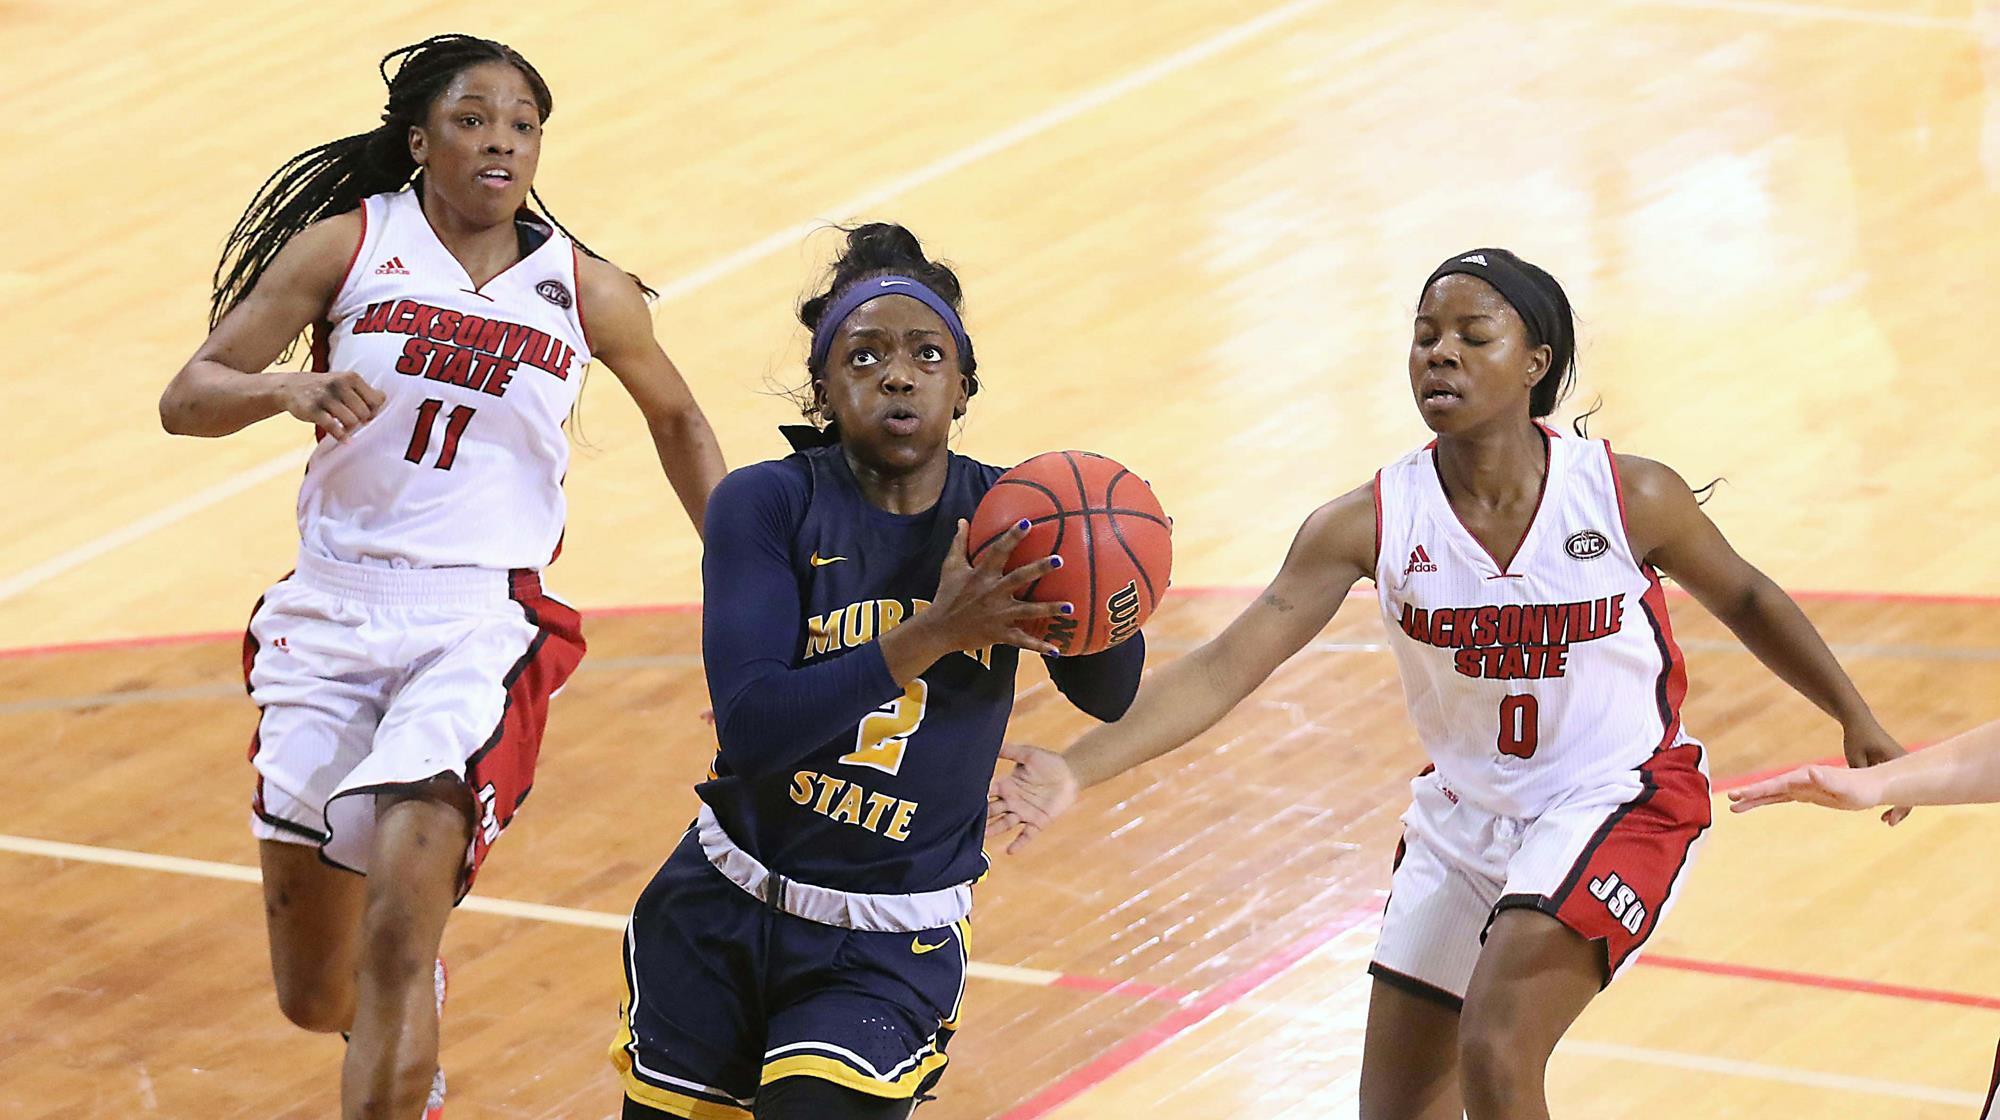 Murray State's James wins weekly OVC women's basketball award